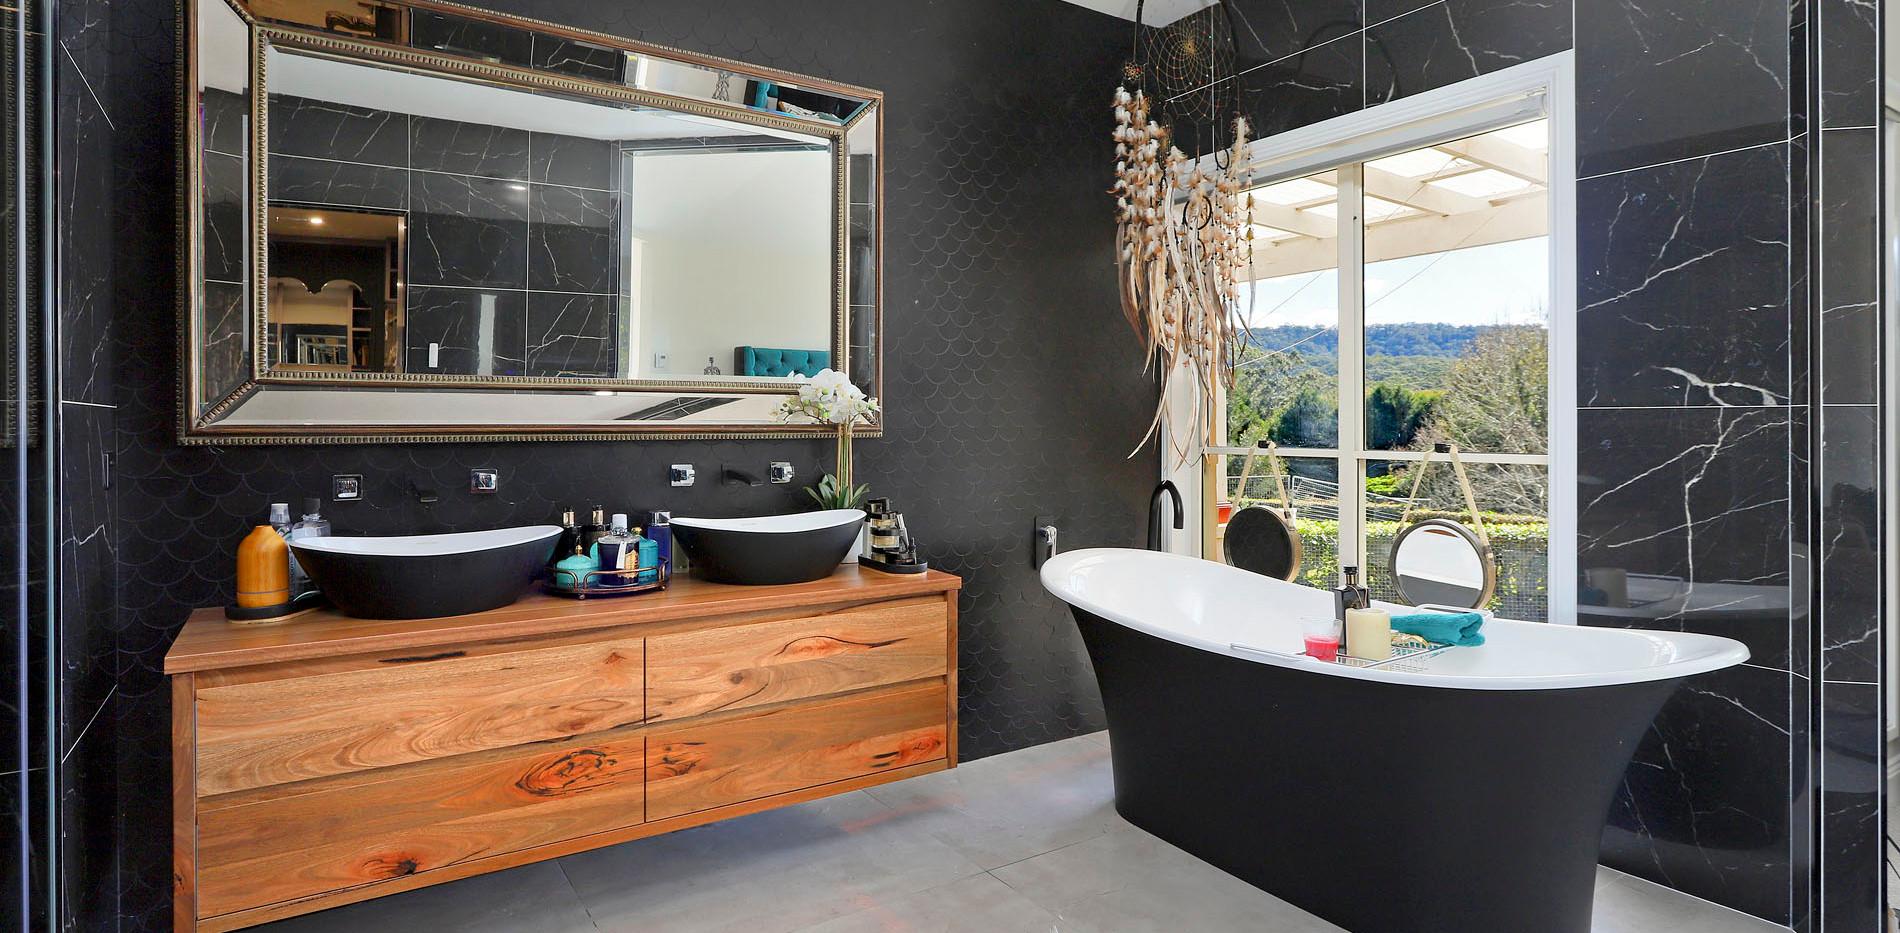 Hawkesbury Bathrooms and Kitchens.5